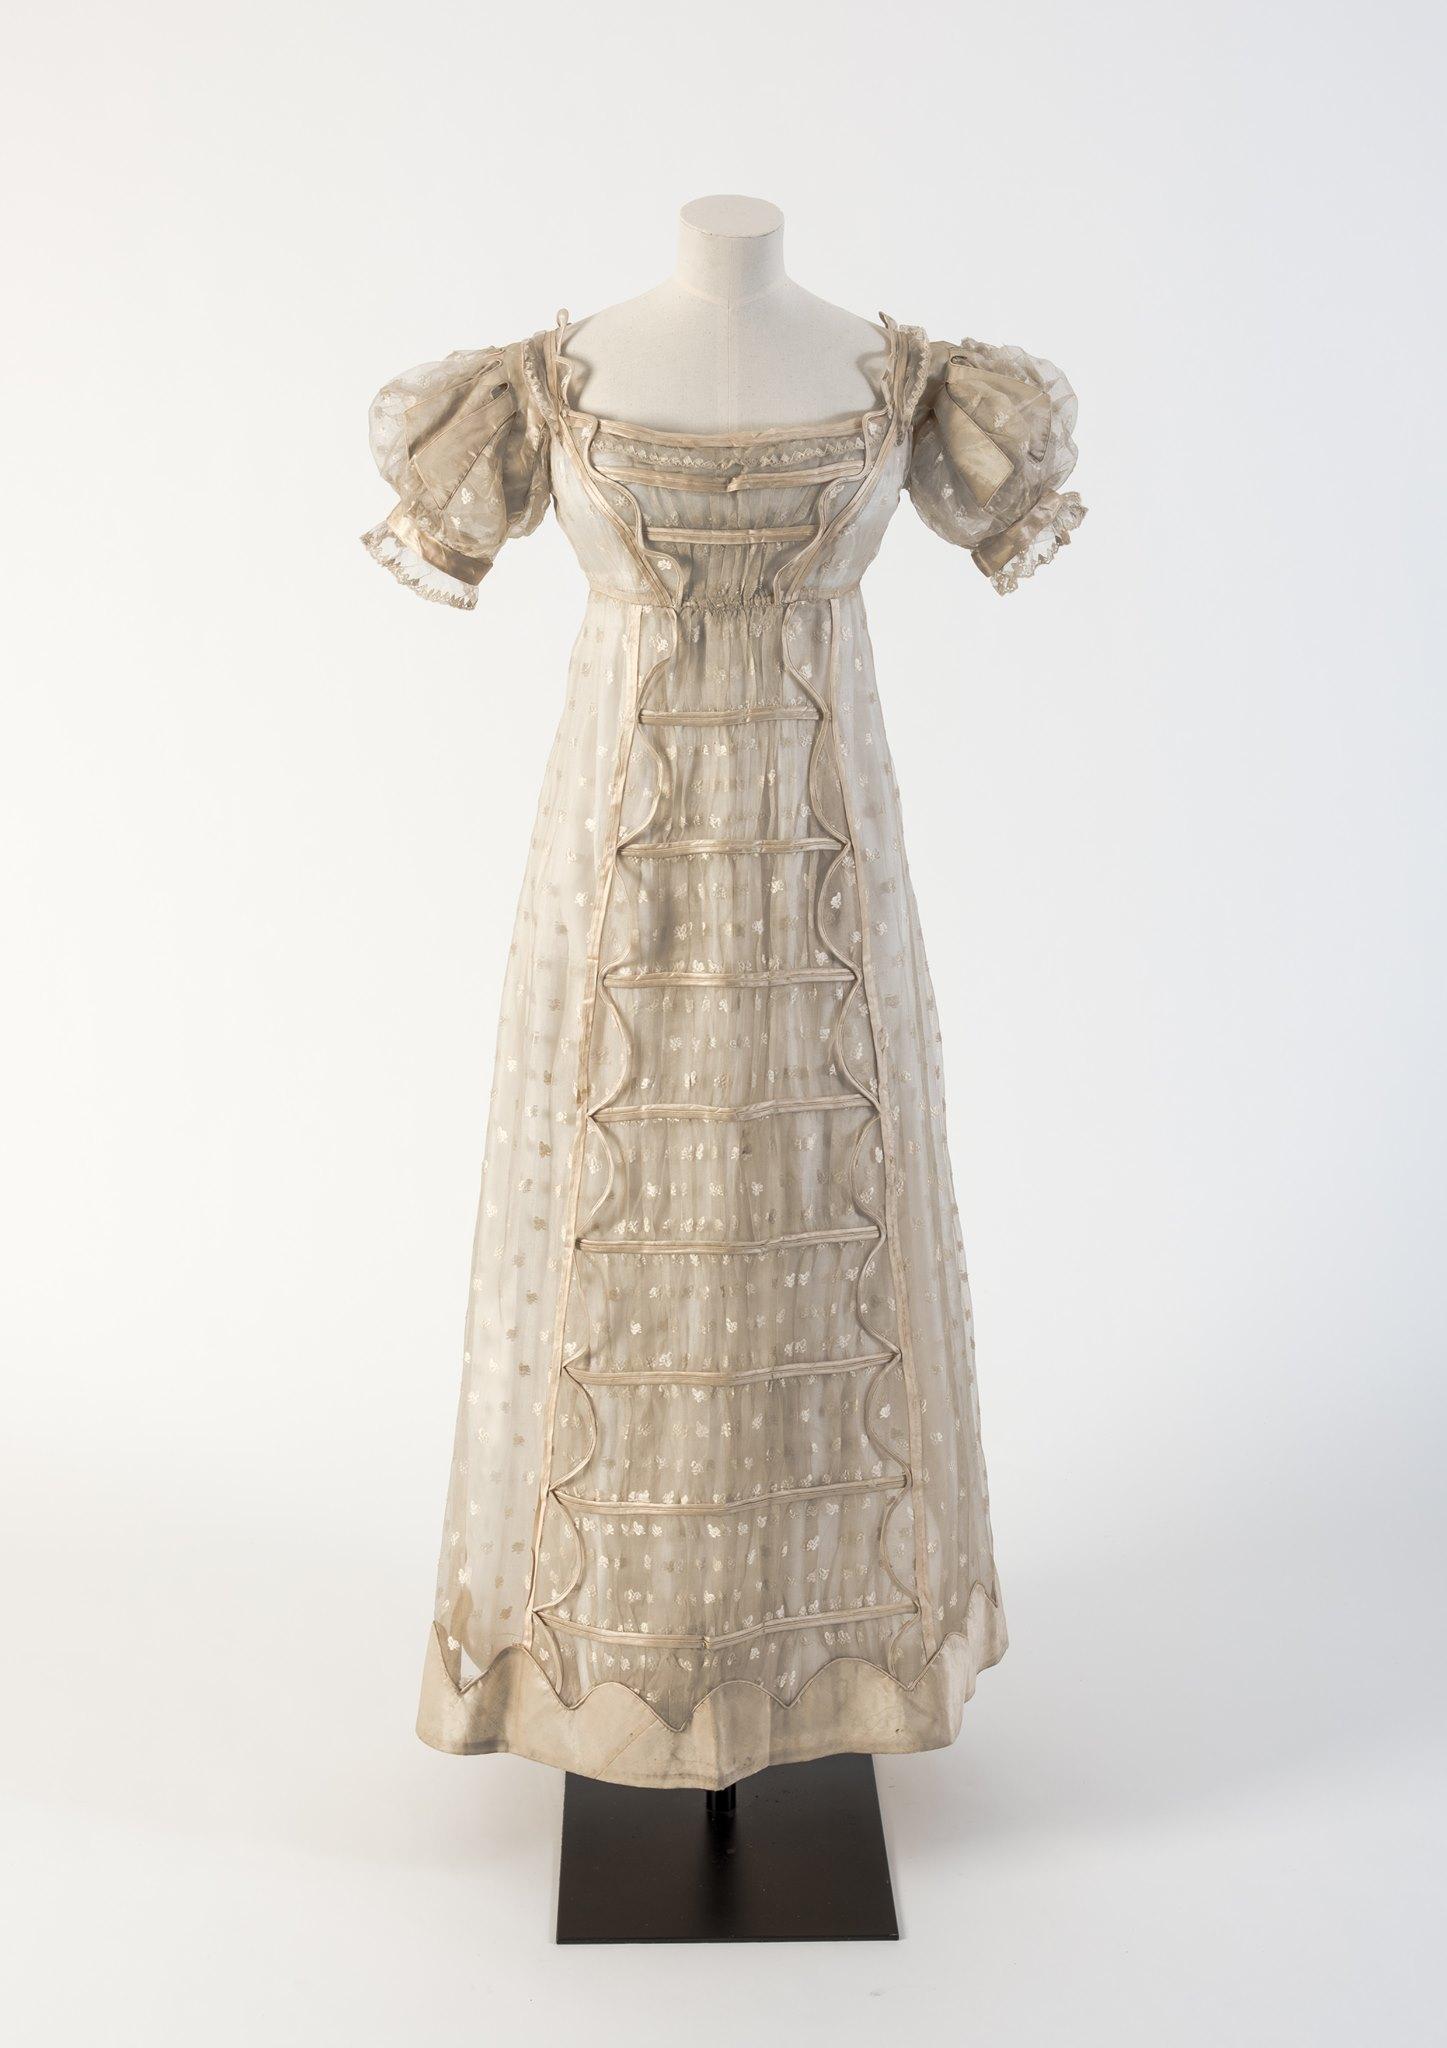 Evening dress, 1817, patterned silk gauze called 'Madras lace' with silk satin trim, Fashion Museum Bath